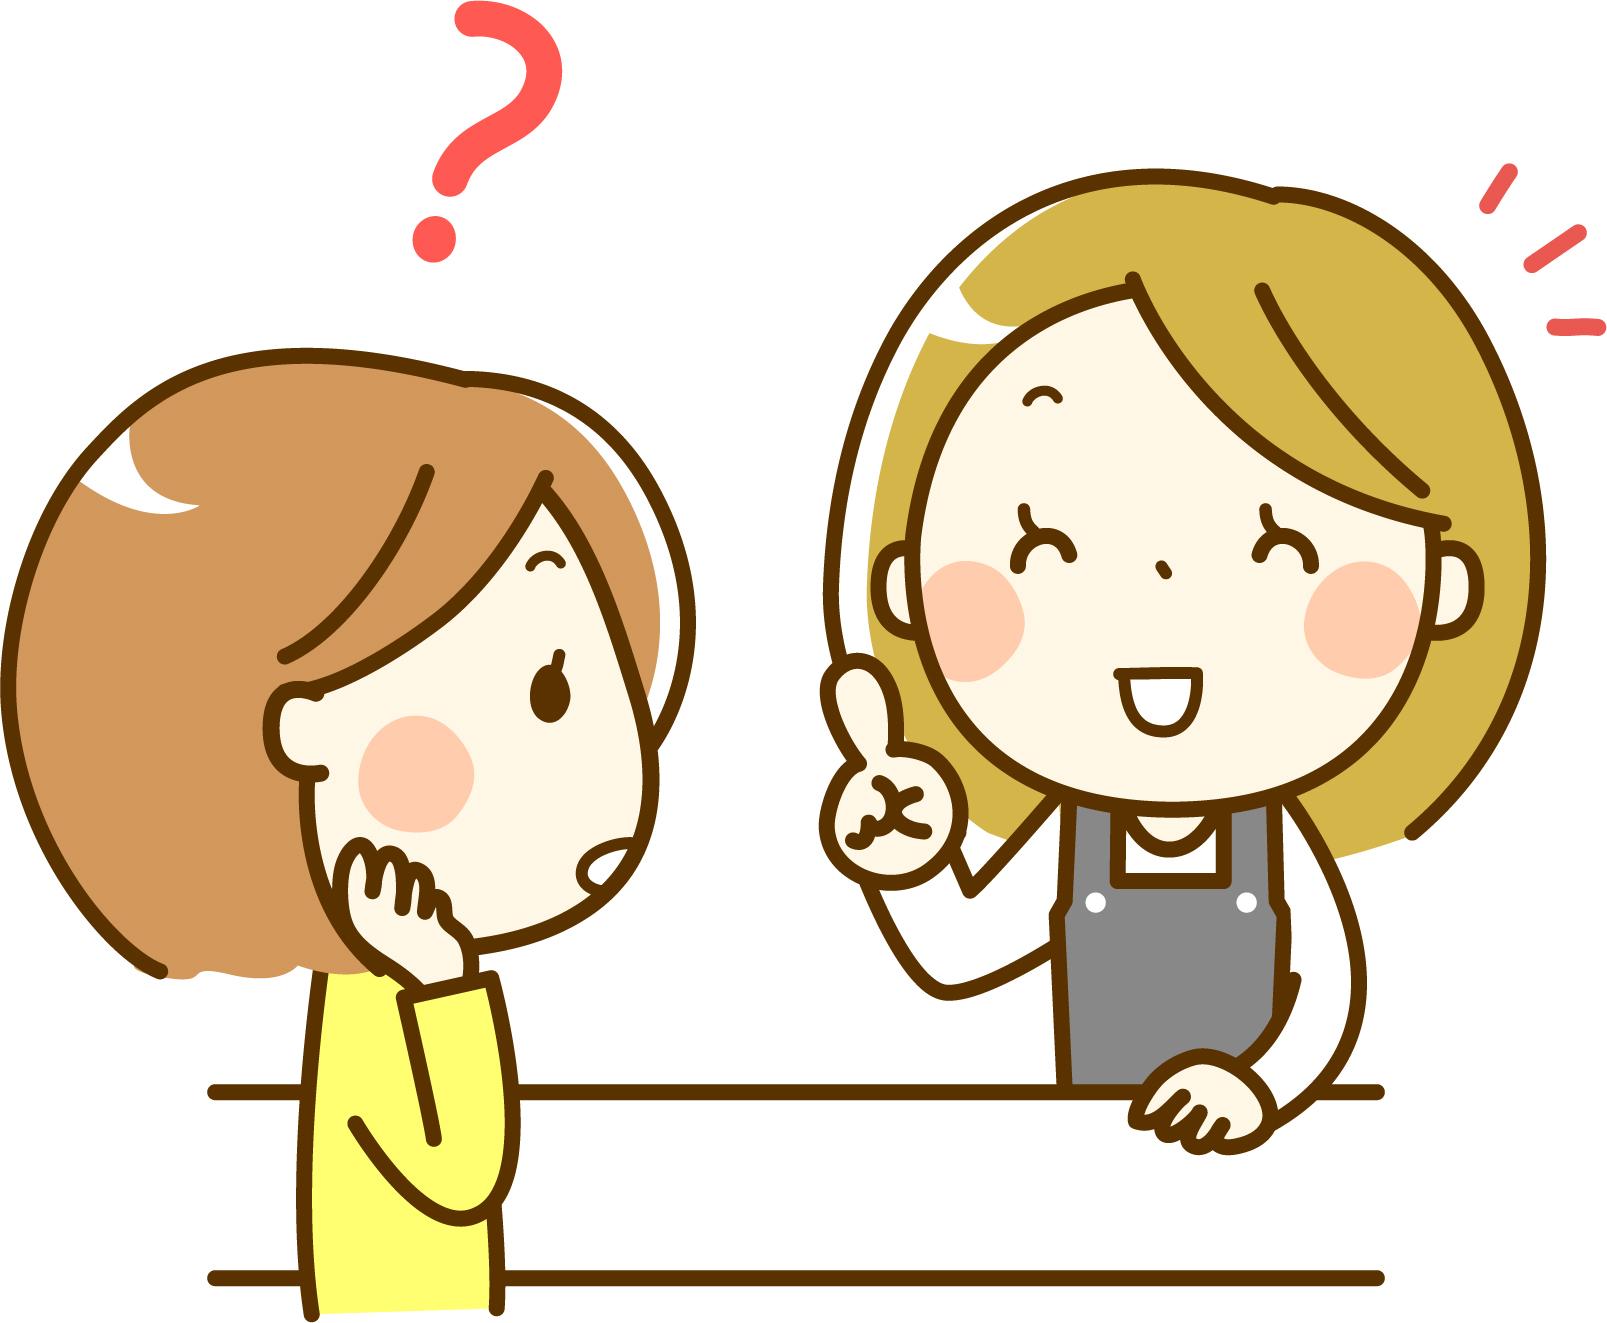 SOELUのカスタマーサポートに問い合わせる女性